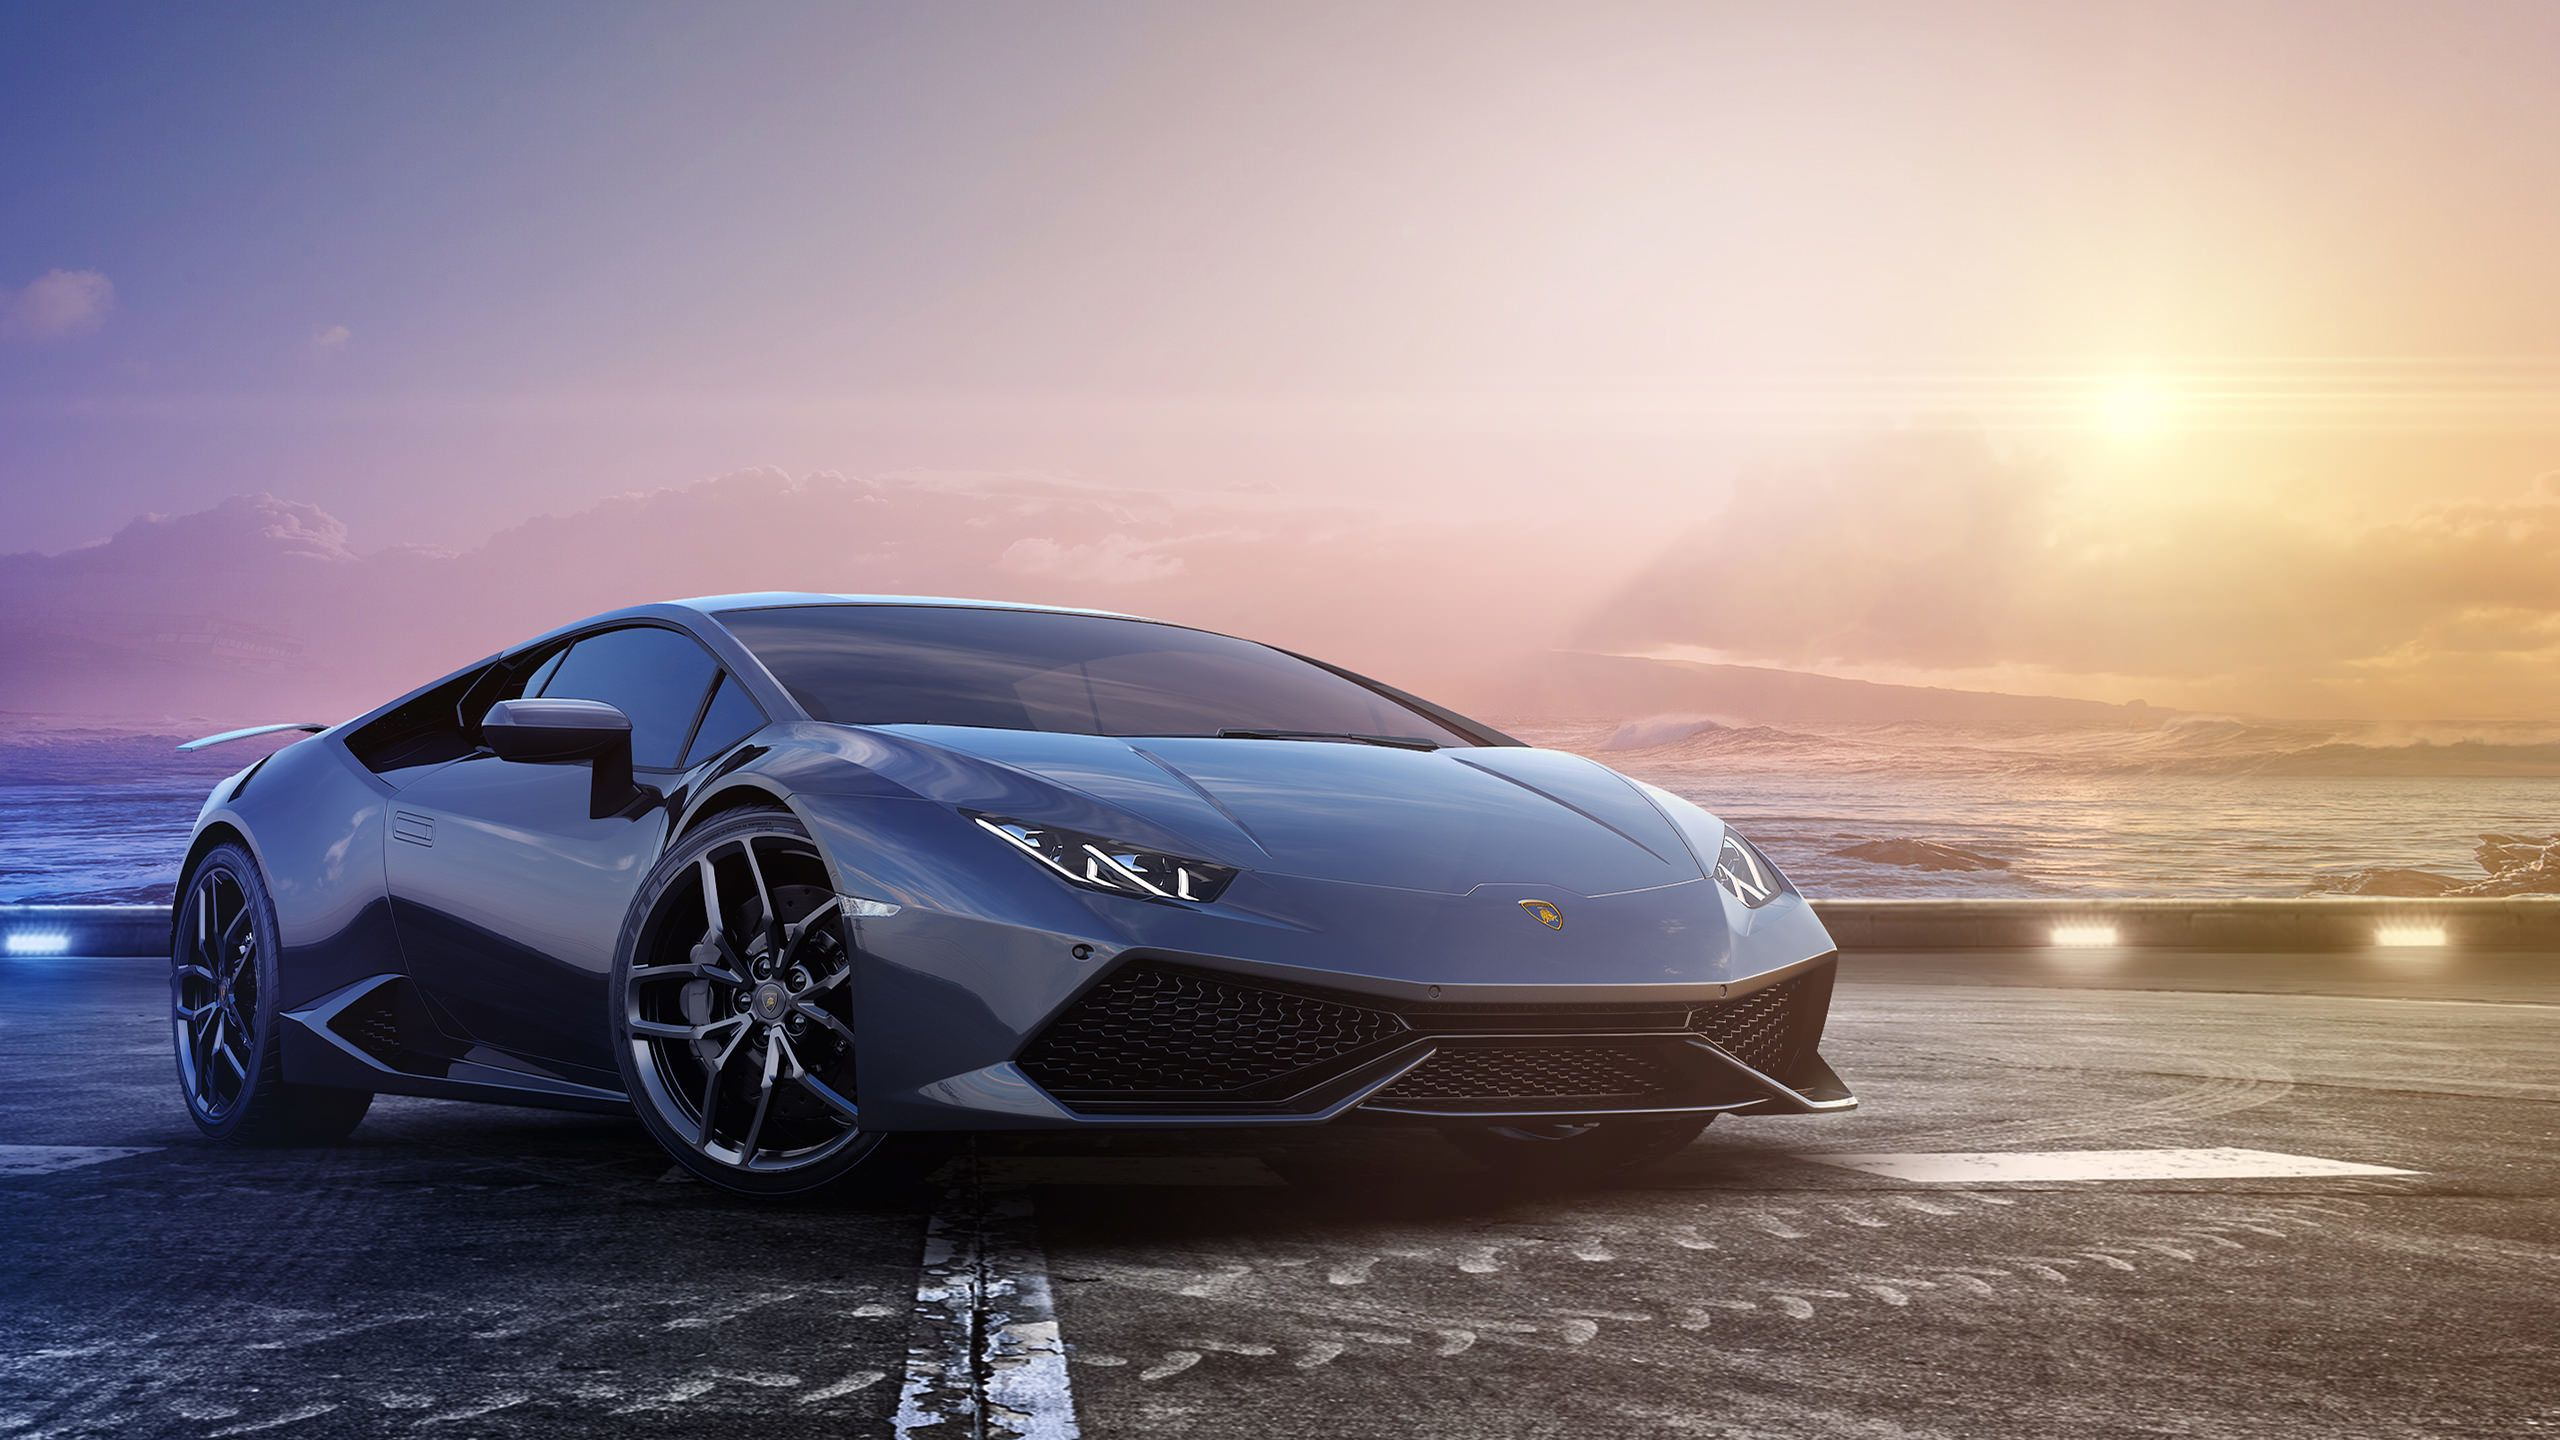 Sport Cars Wallpaper For Iphone 7: Lamborghini Wallpaper For Iphone #6Vu